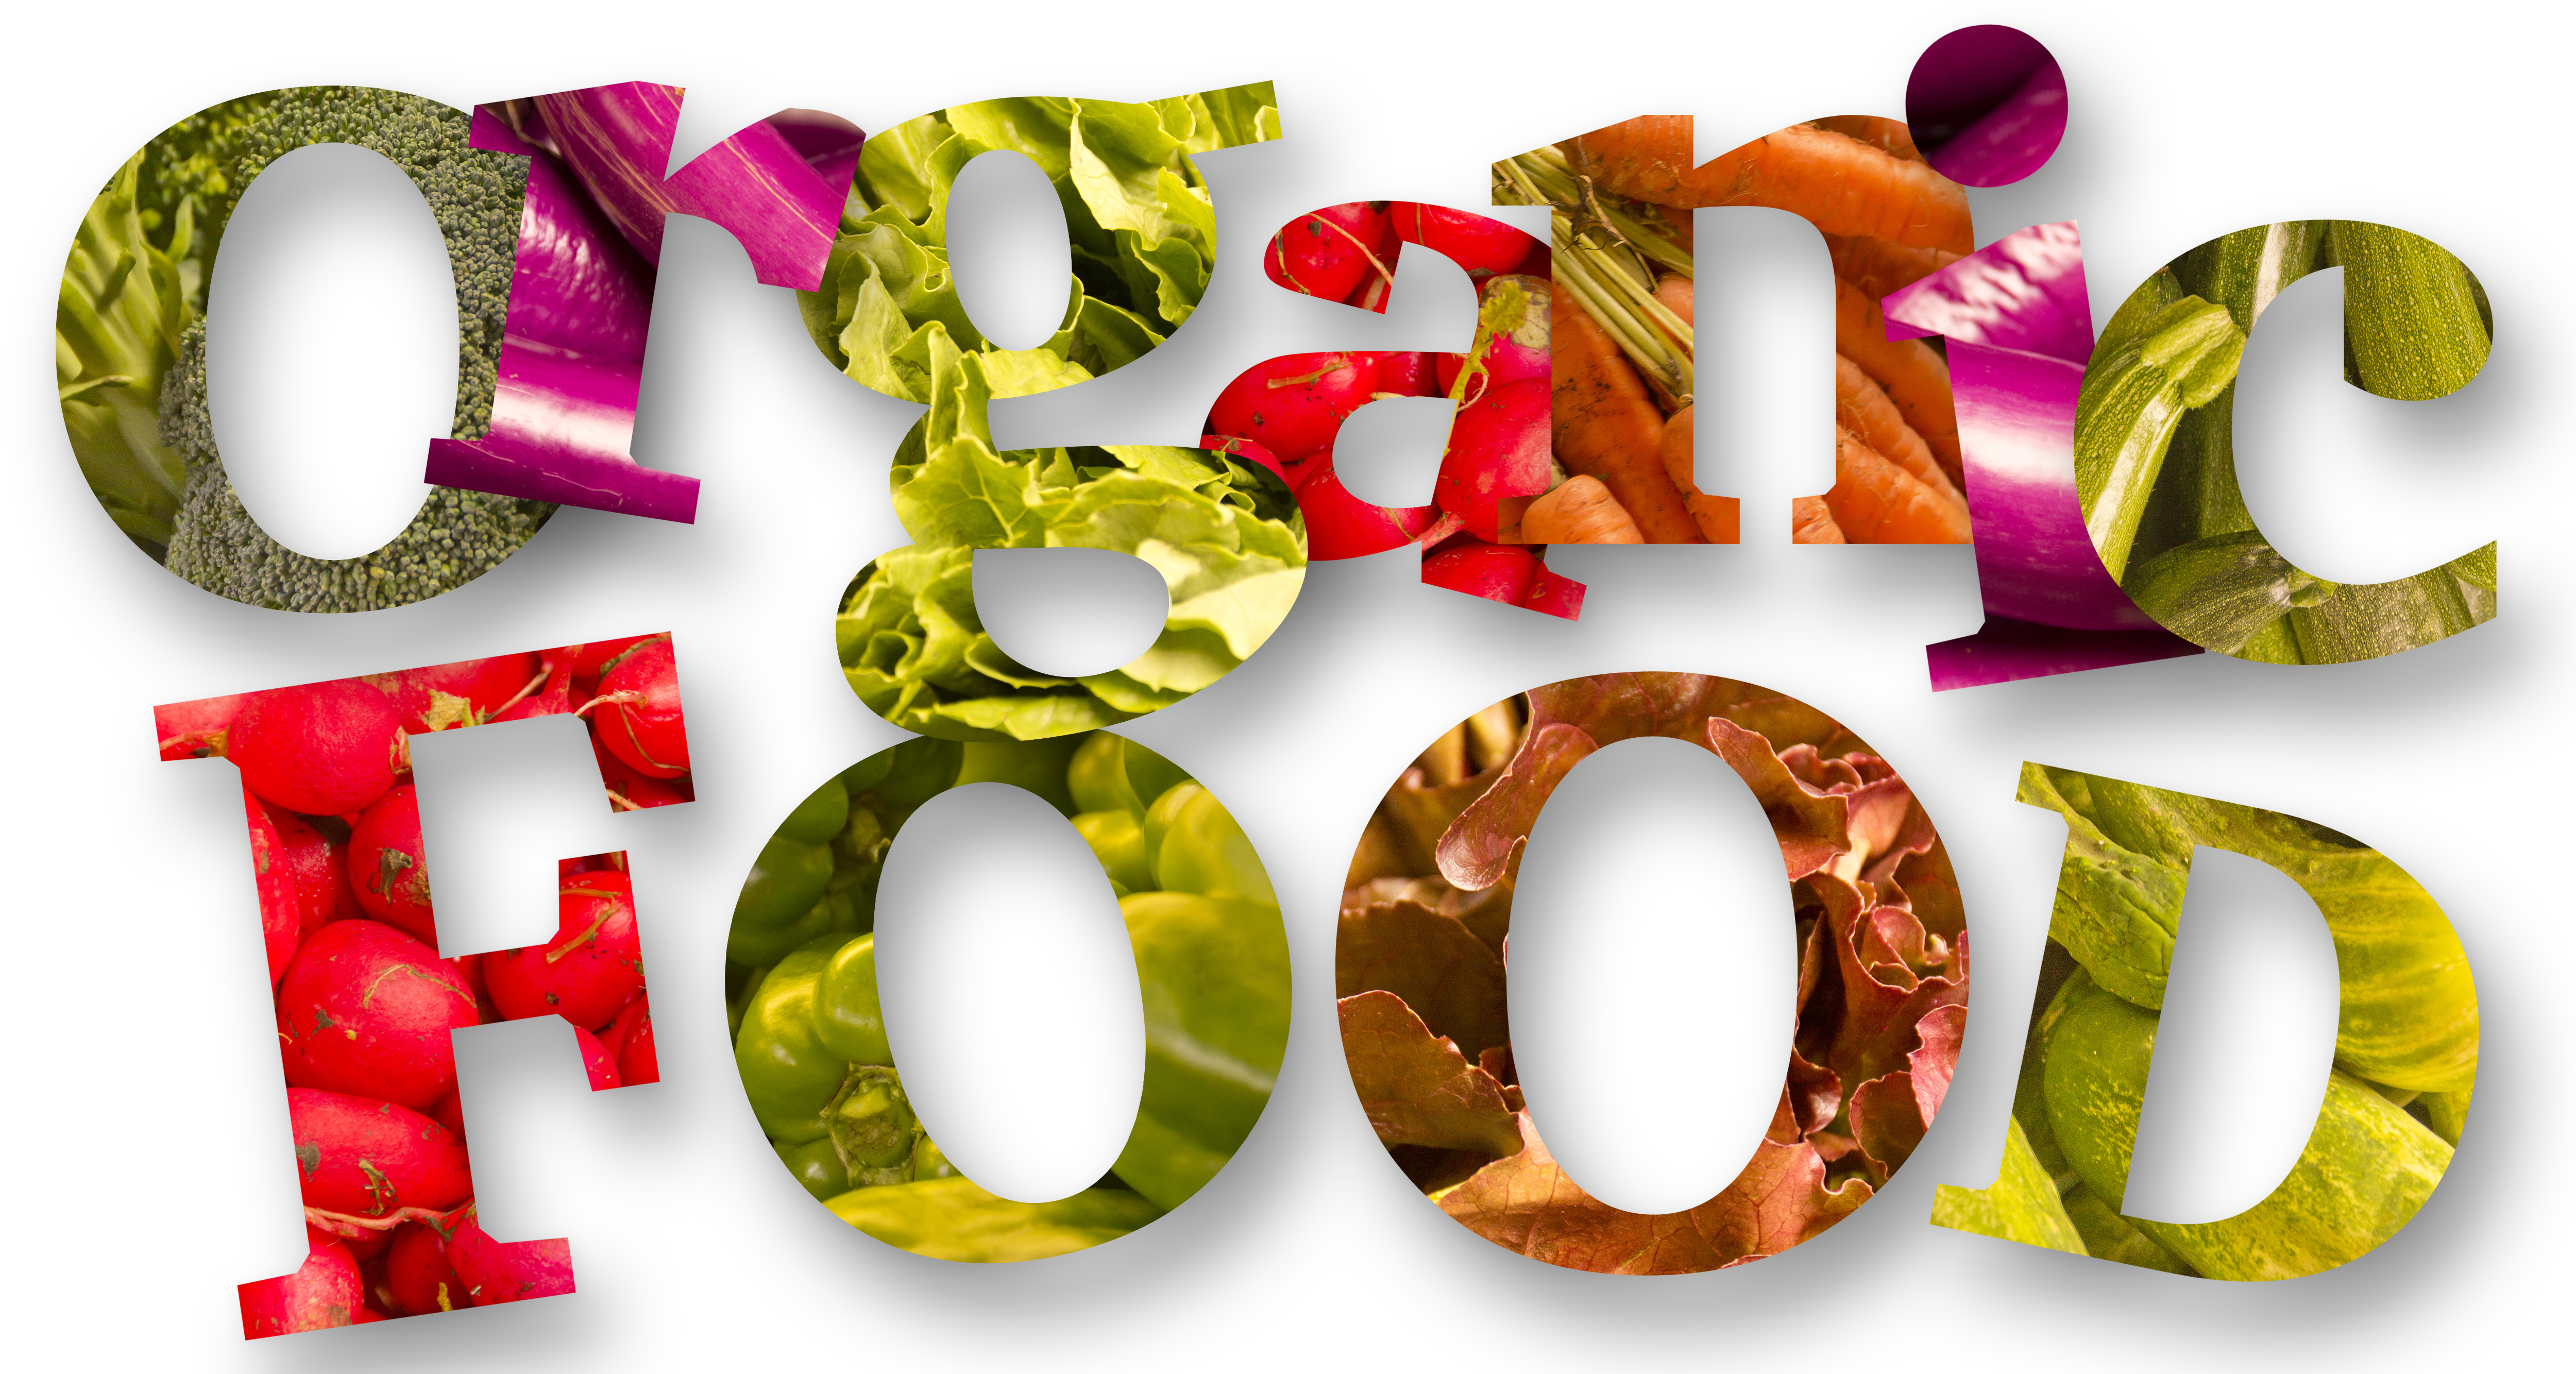 going organic - pets - organic pet food - dog health - healthy dogs - organic dog food - fur babies - organic pets - dogs - cats - pets